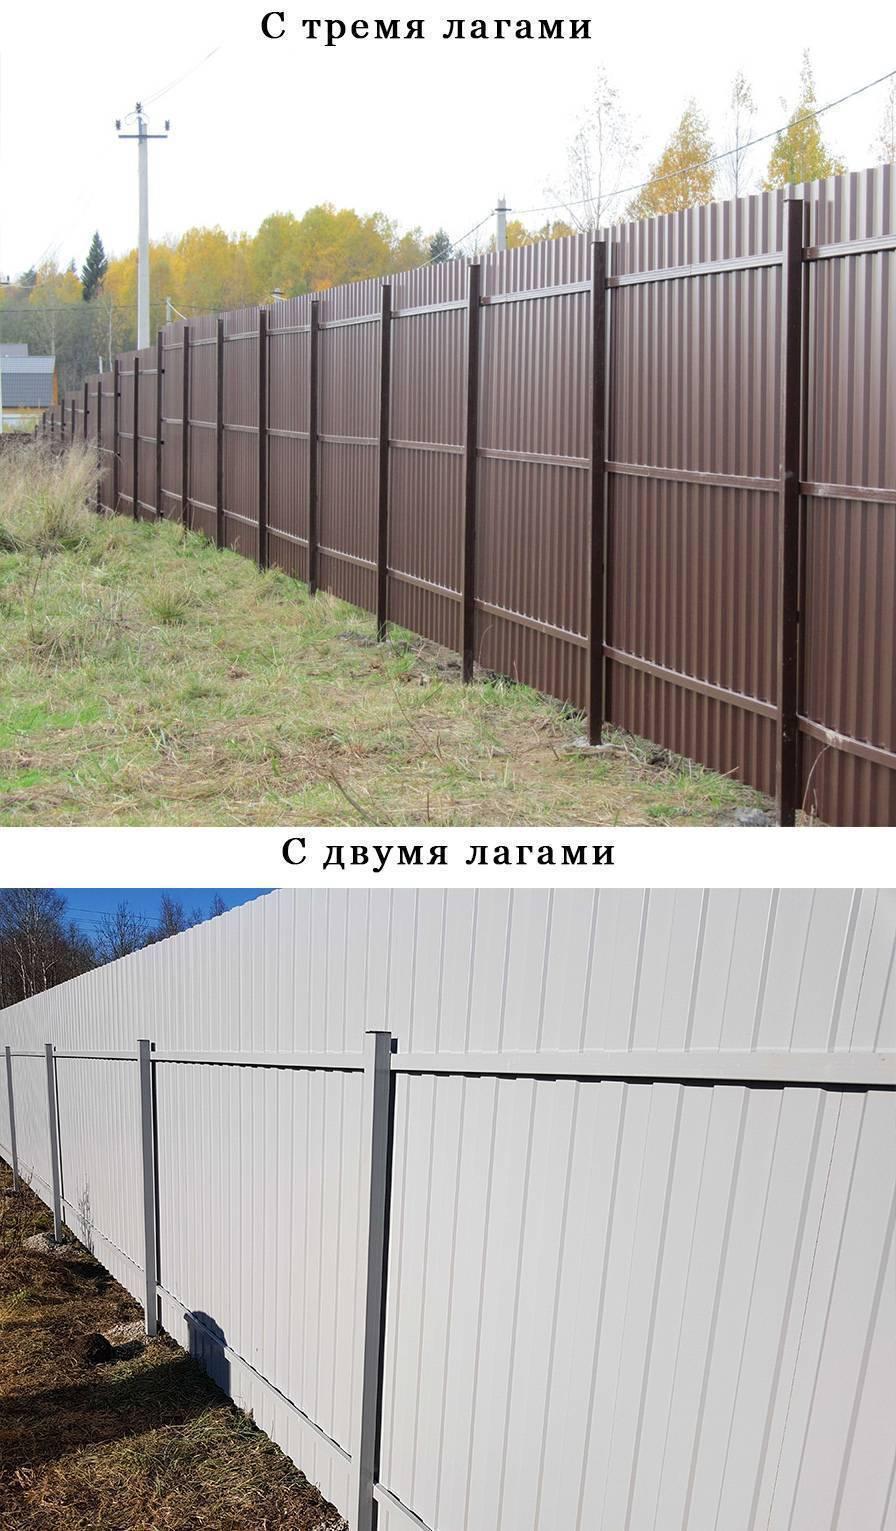 Забор и ворота из профнастила с калиткой своими руками: установка, фото и цена